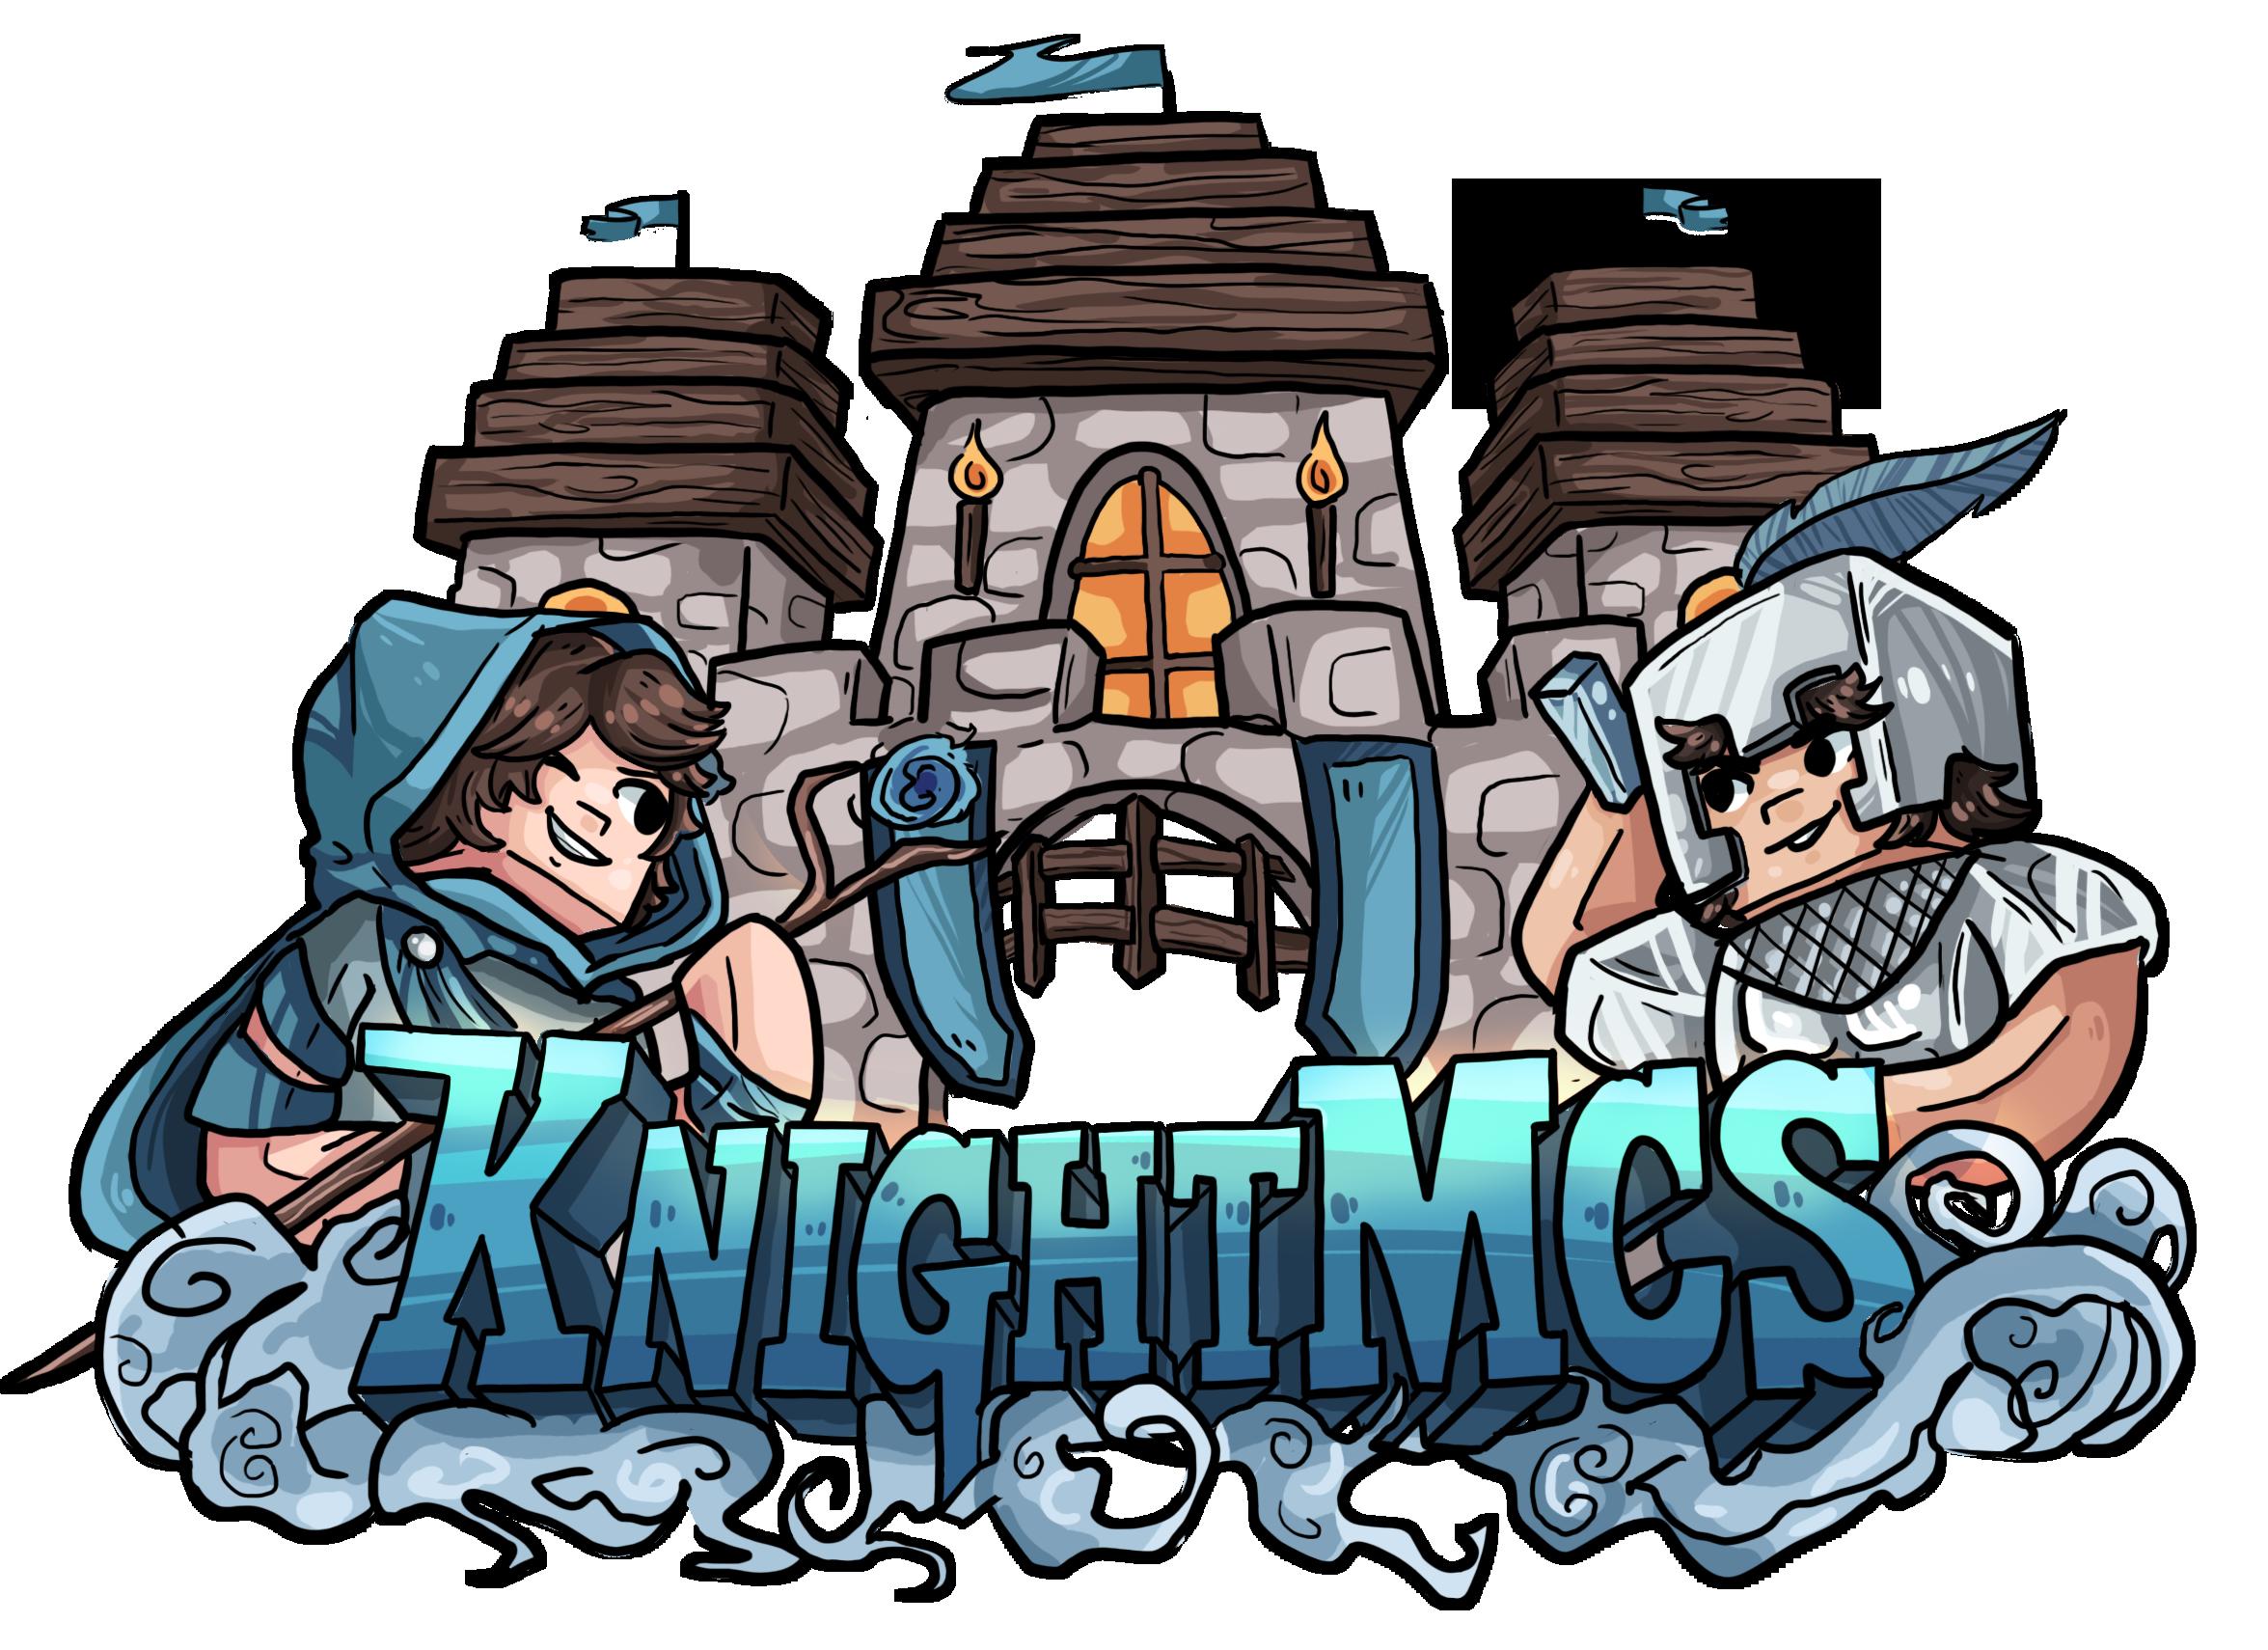 KnightMCS